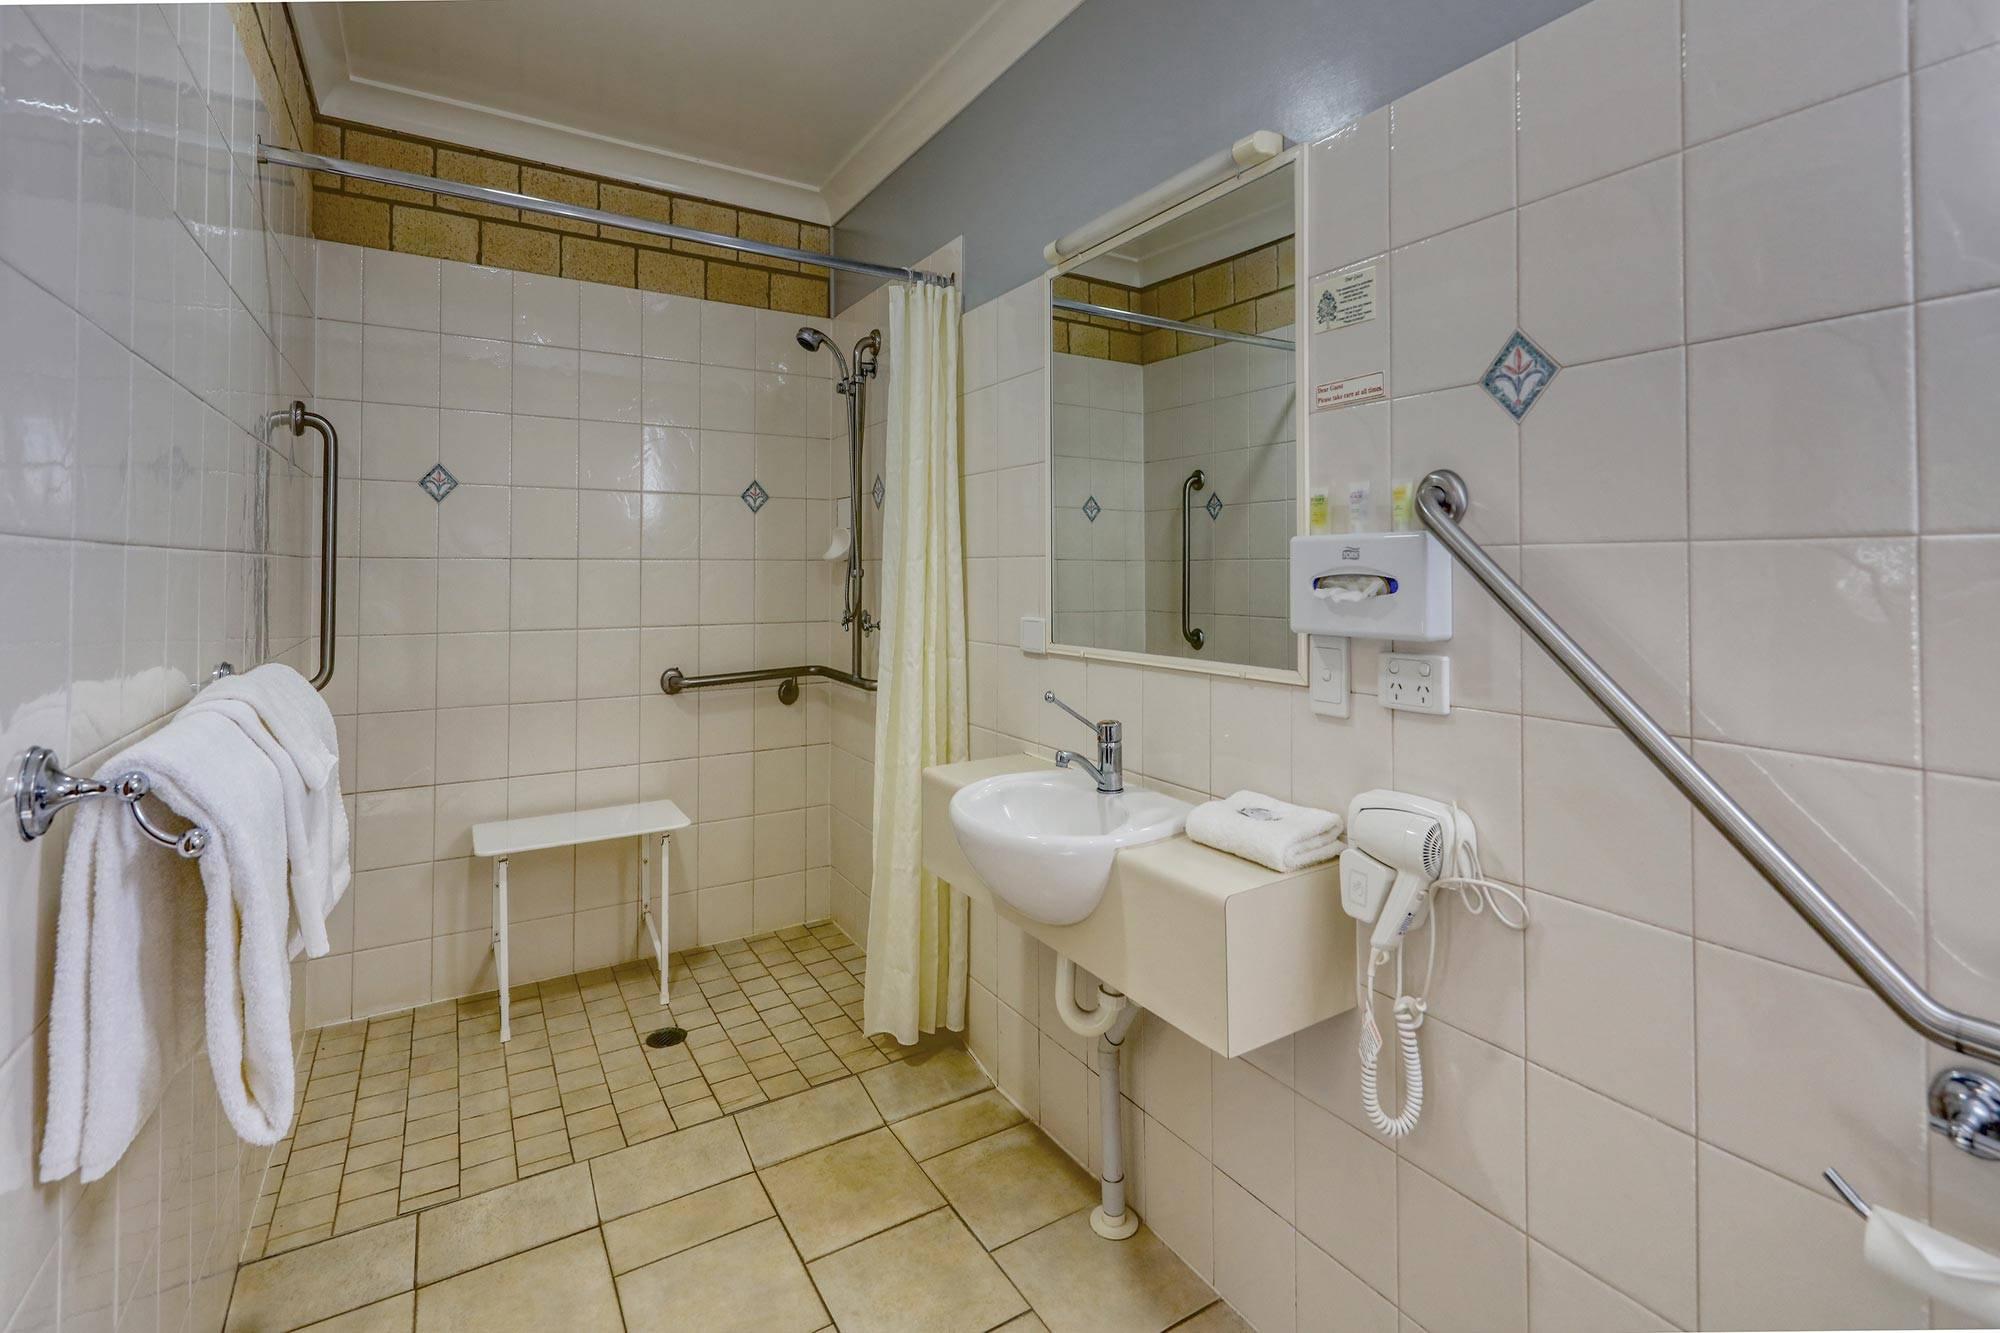 st-george-motel-disabled-king-room (3)